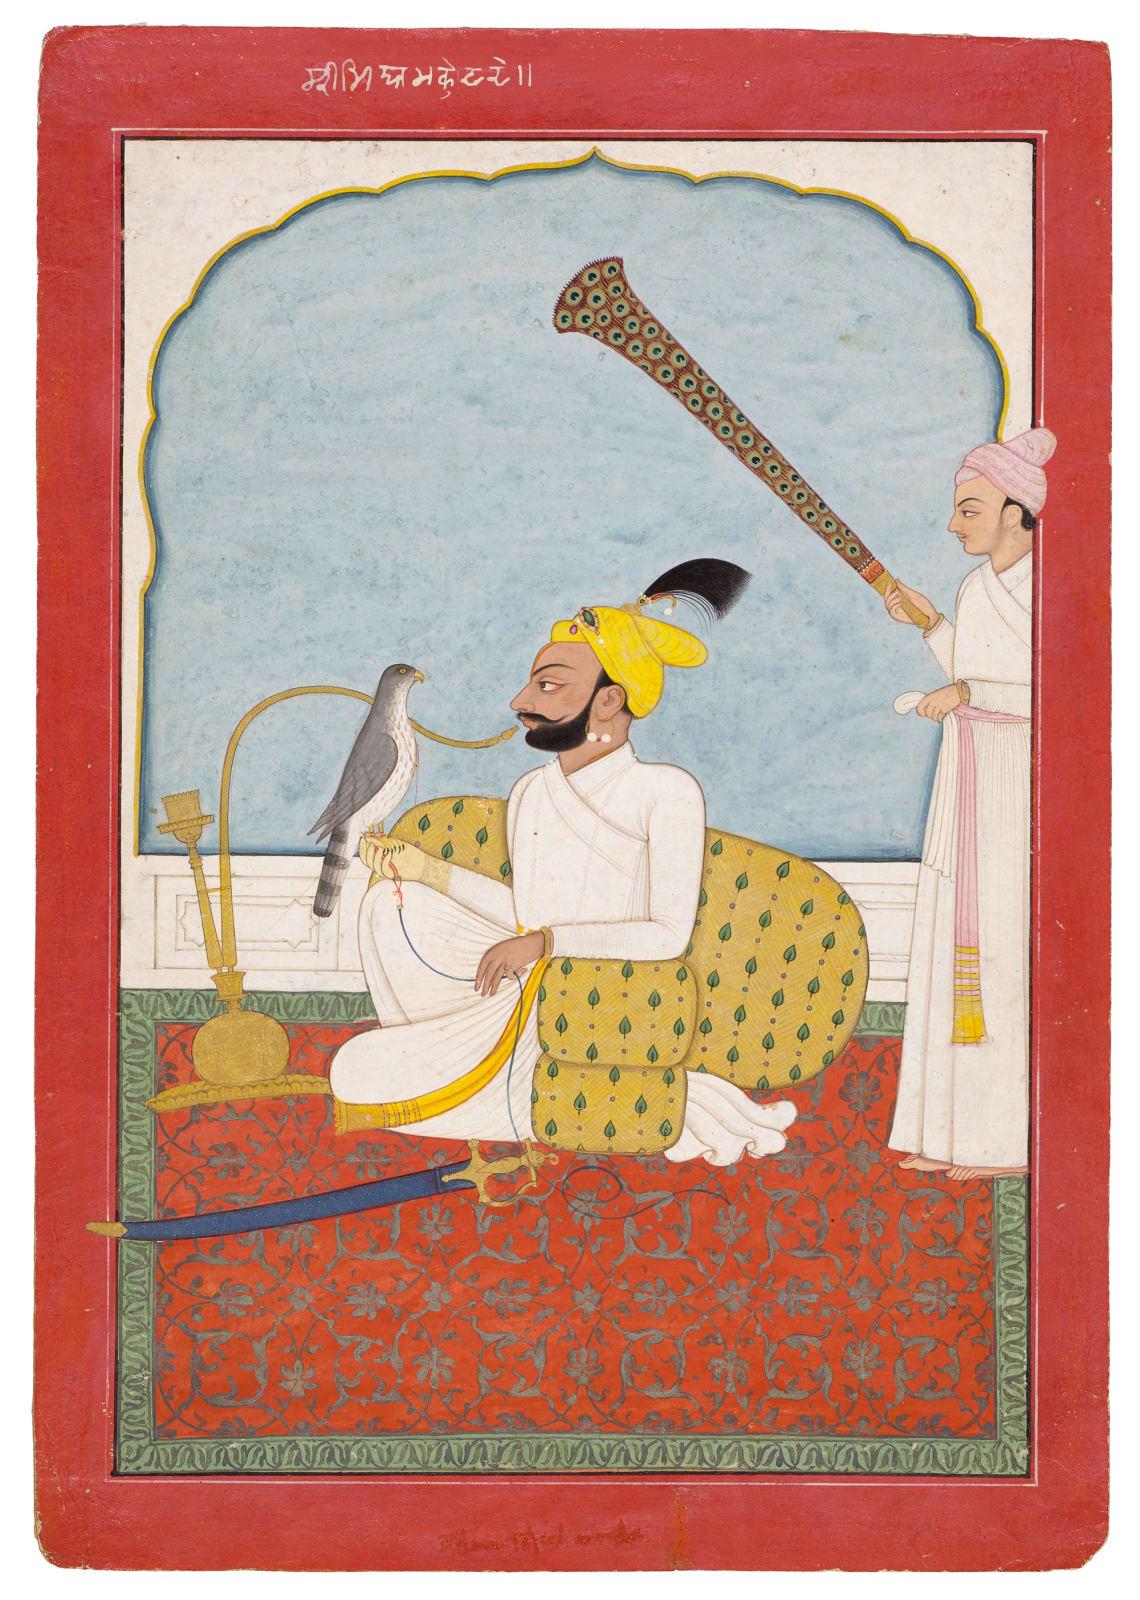 Mian Mukand Dev of Jasrota, Jasrota or Jammu, under Guler influence, c. 1740